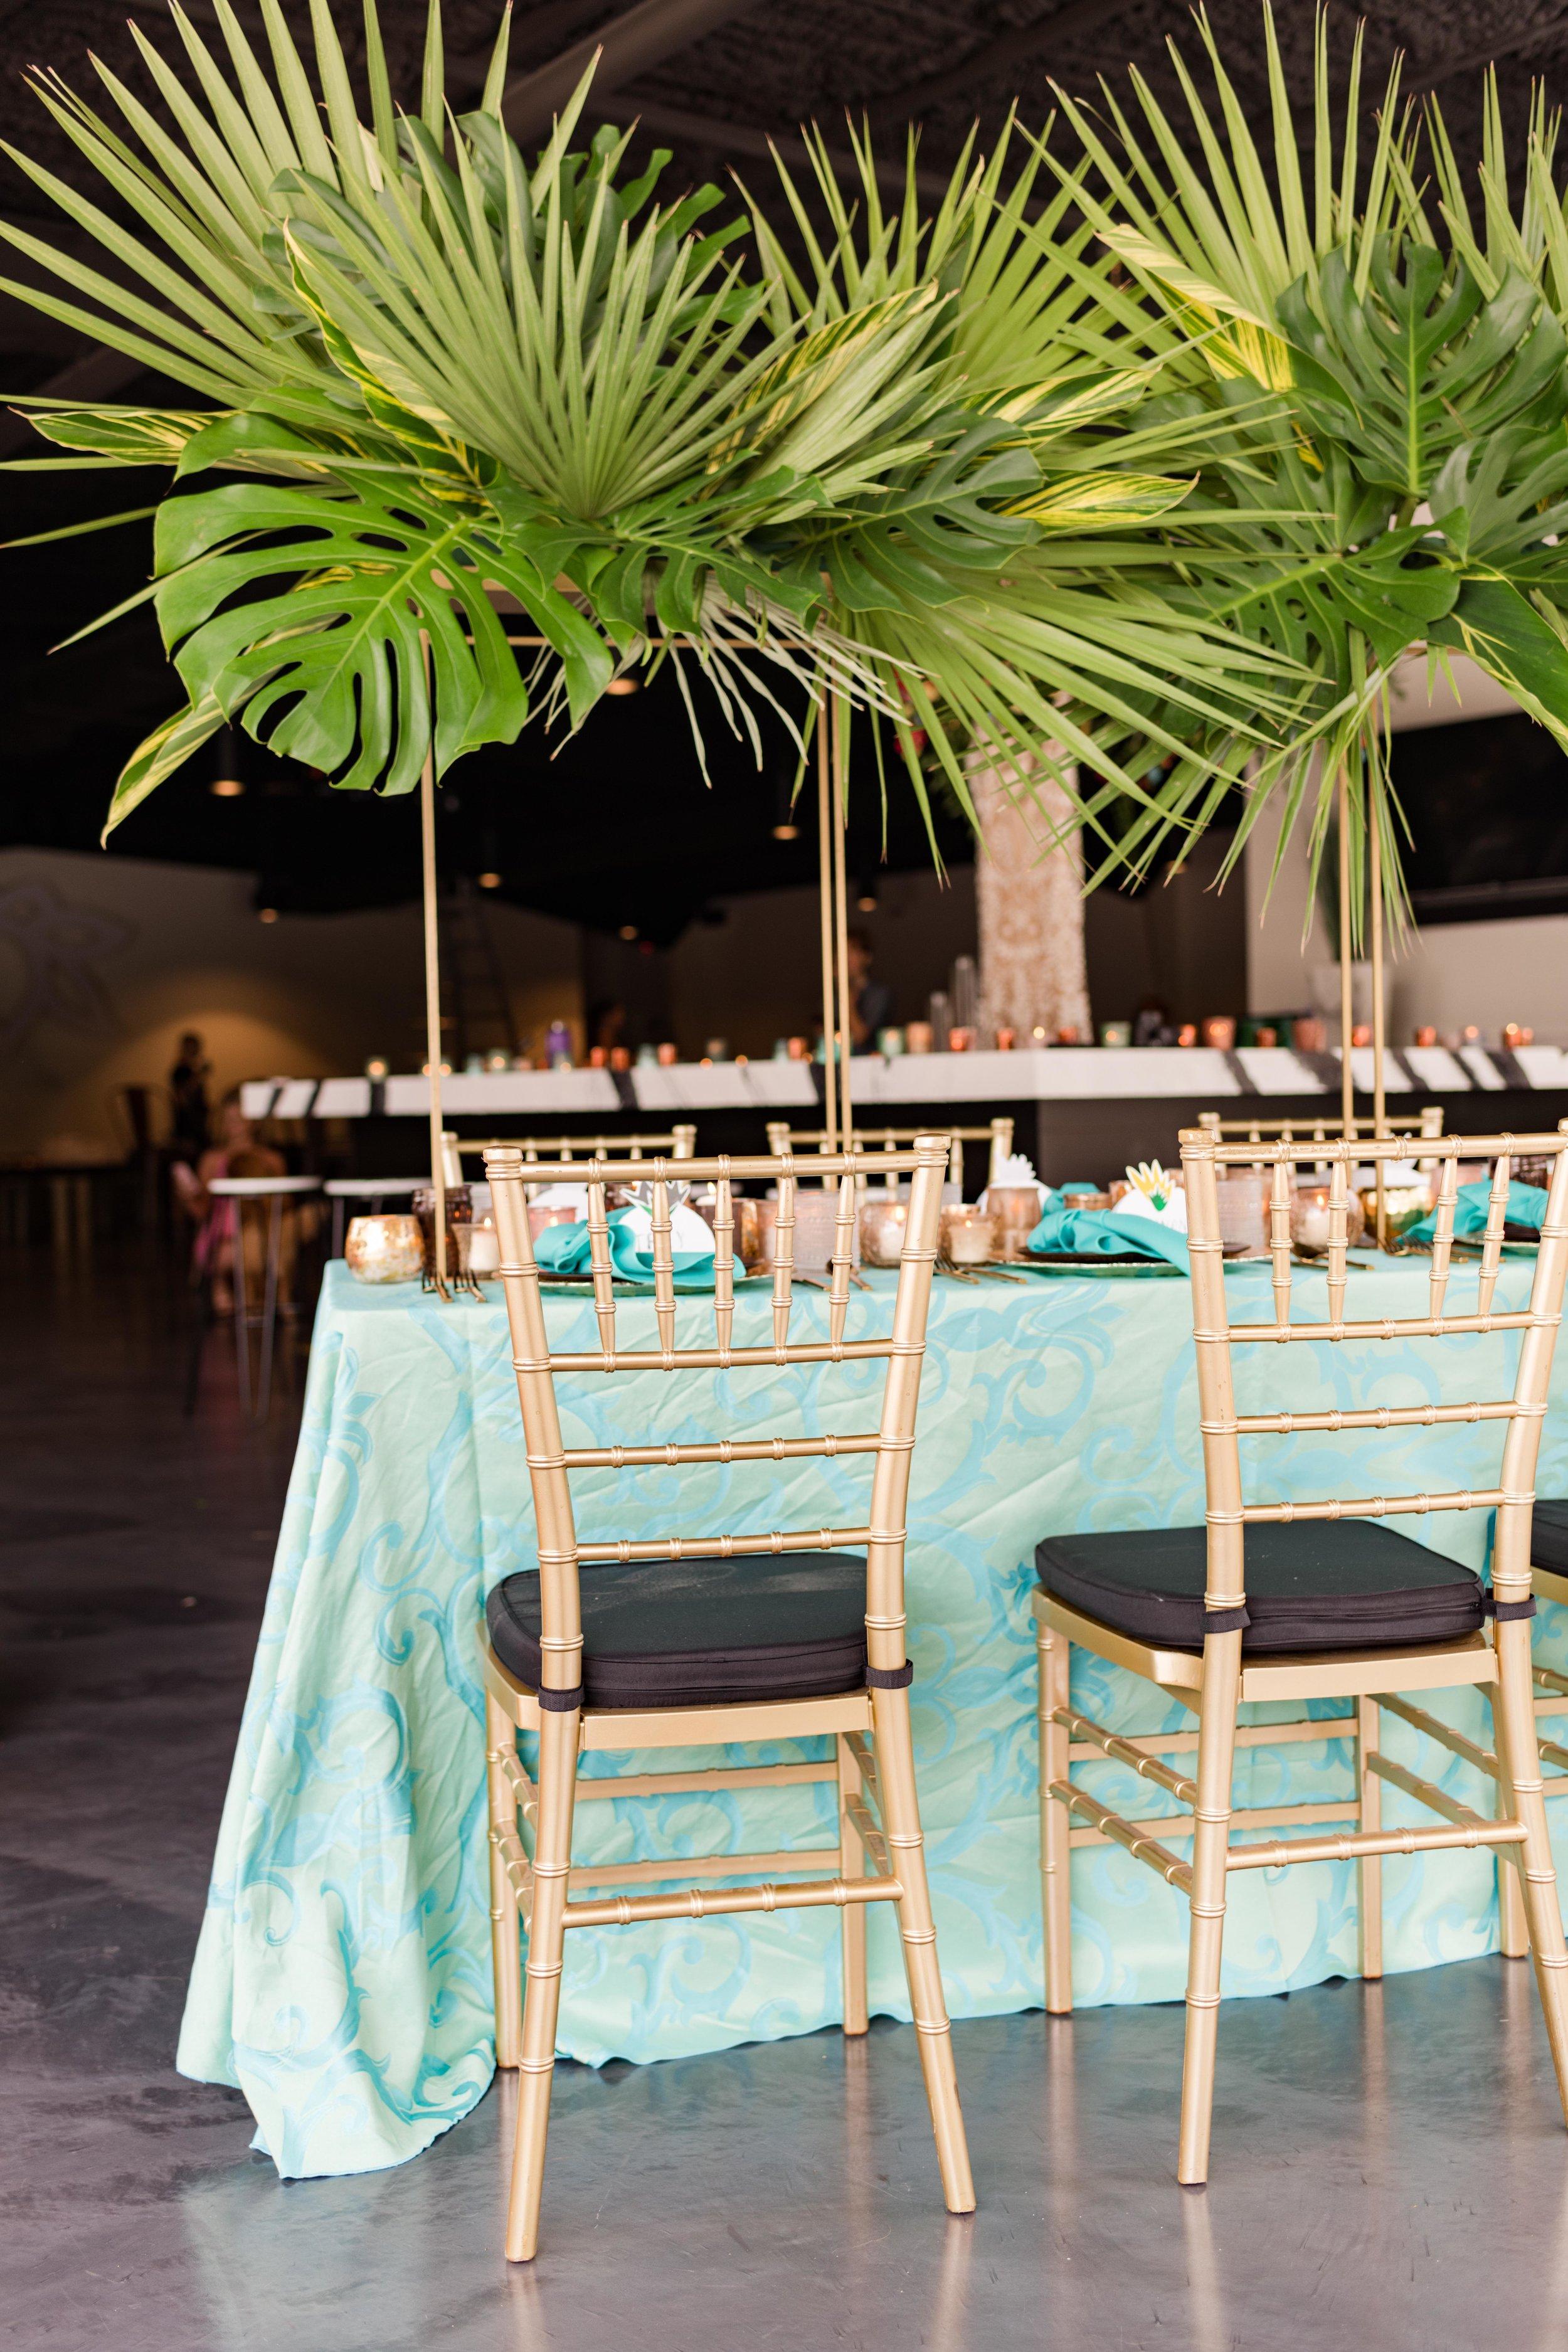 ivory-and-beau-savannah-carnaval-tropical-wedding-inspiration-the-clyde-wedding-venue-savannah-wedding-florist-savannah-wedding-planner-tropical-wedding-inspiration-savannah-wedding-planner-event-designer.jpg